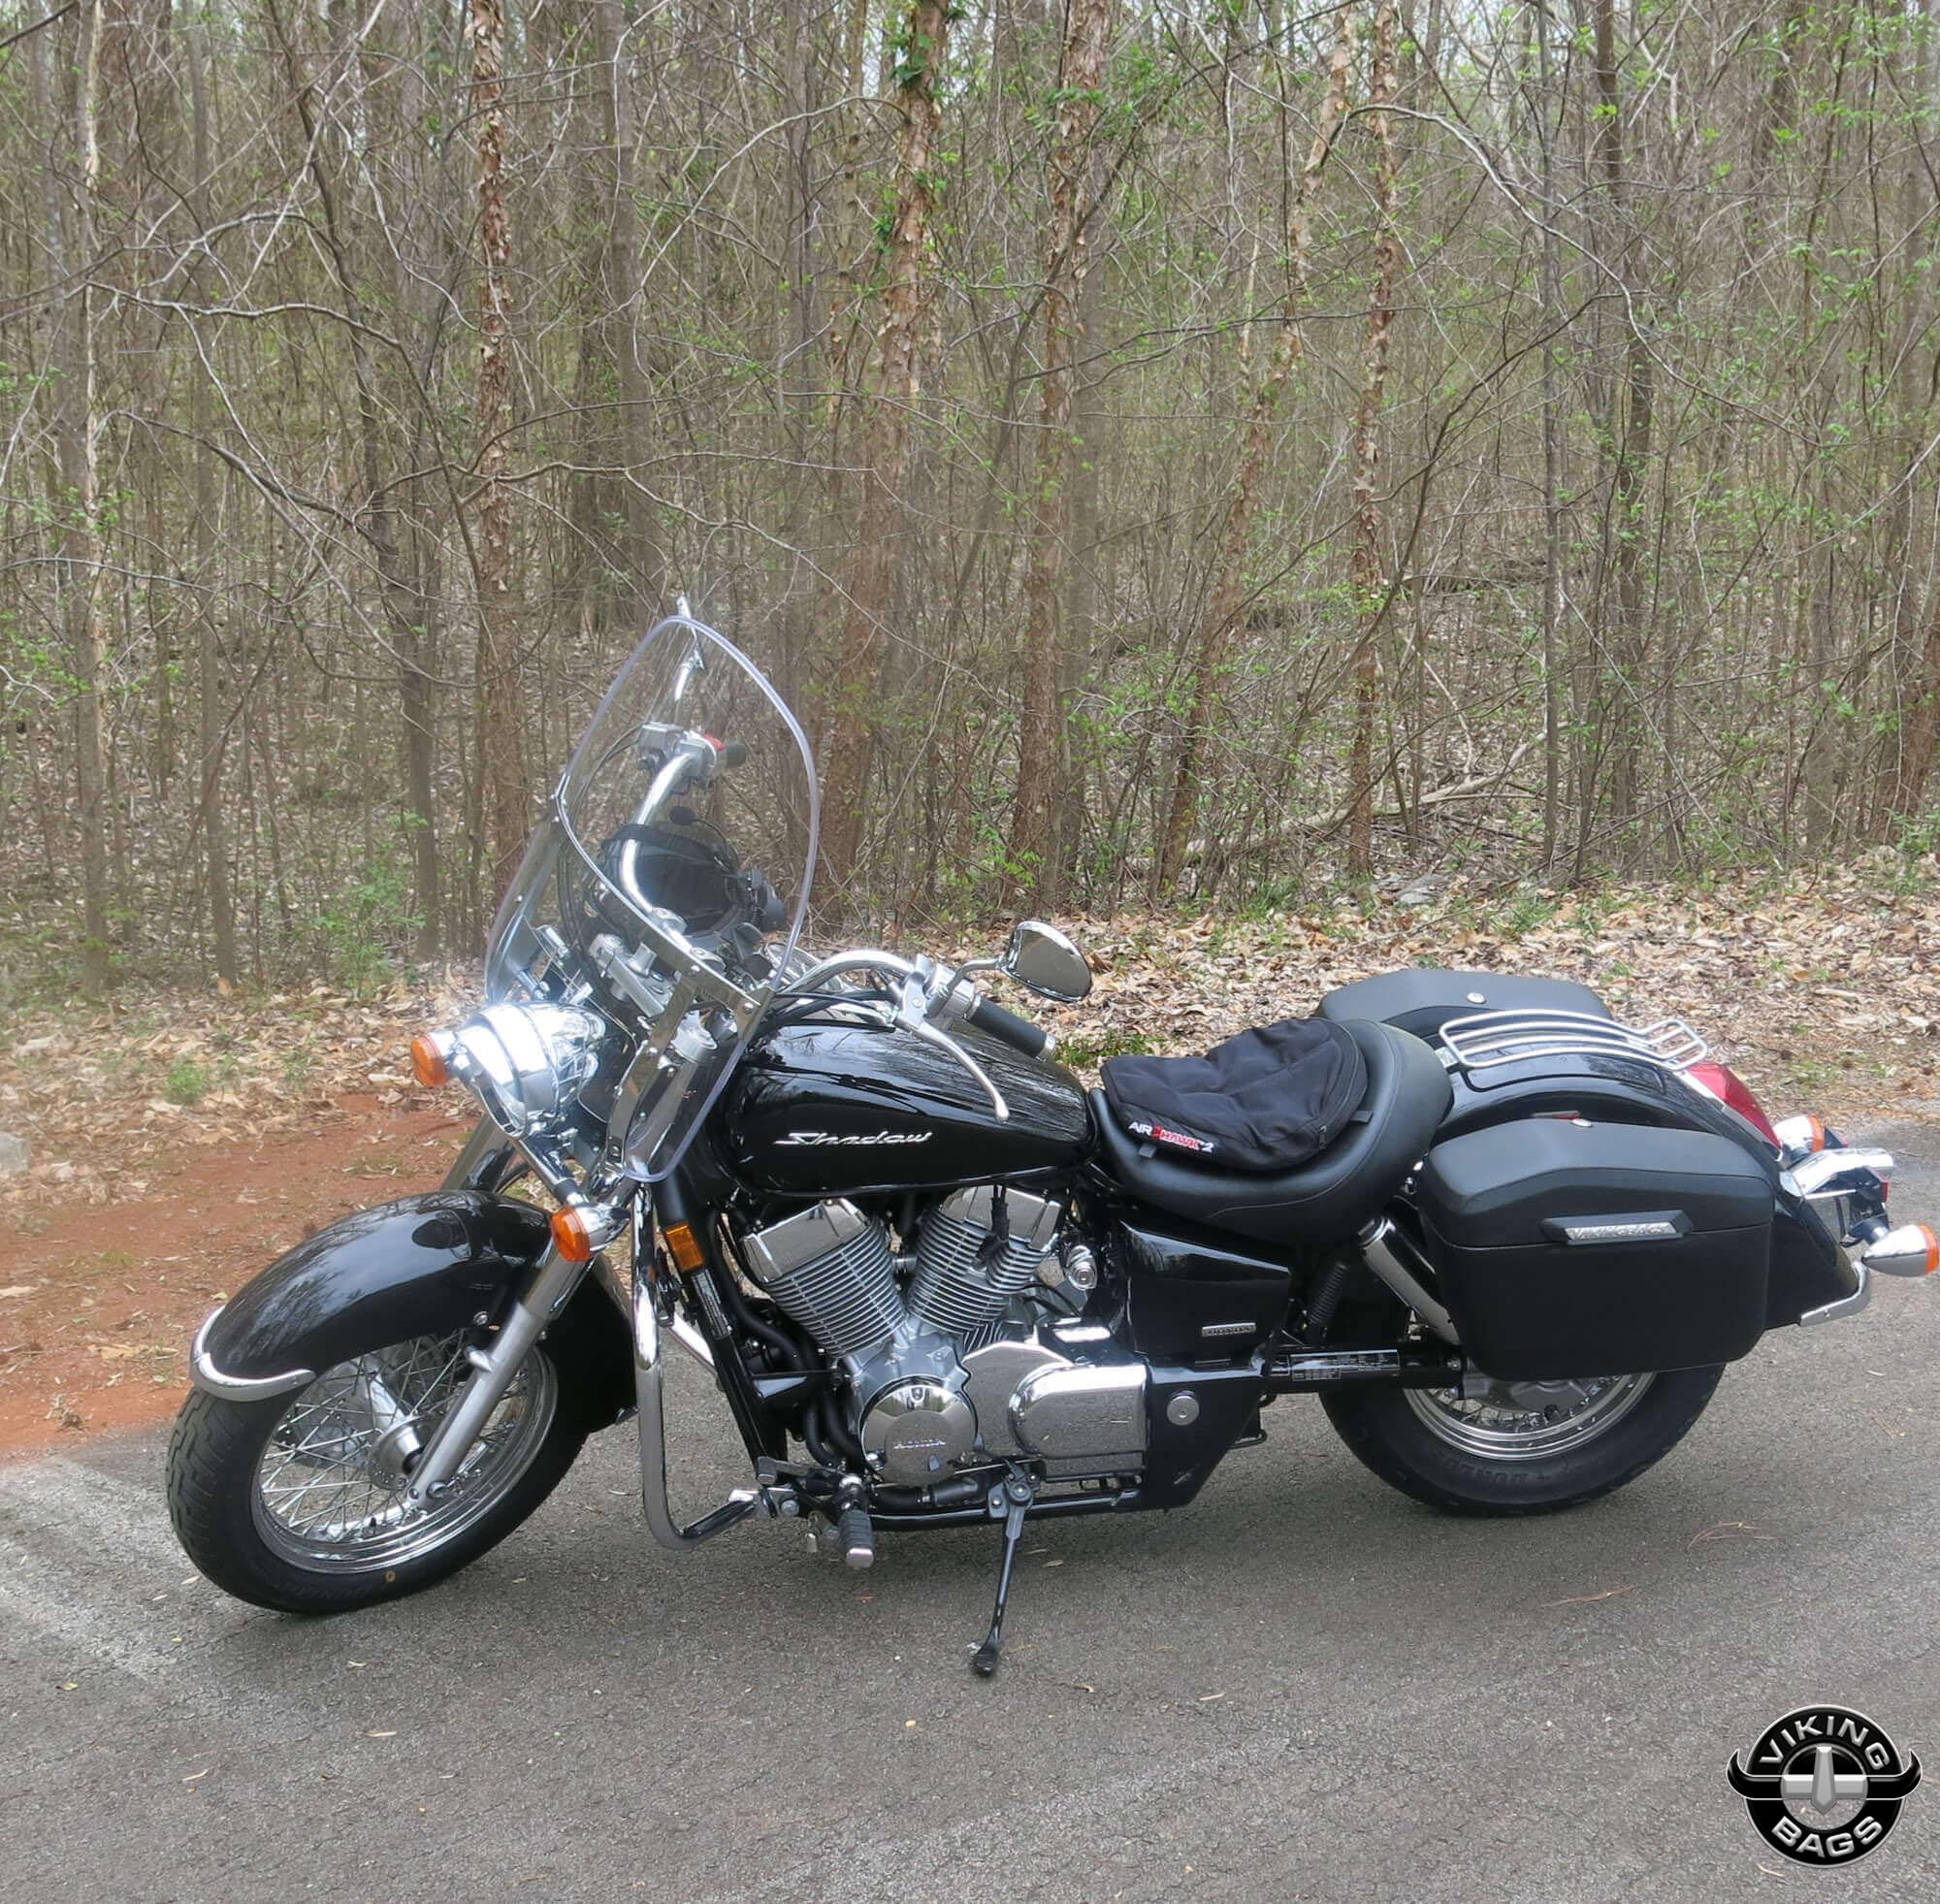 ... Stephen's '13 Honda Shadow w/ Lamellar Hard Motorcycle Saddlebags ...